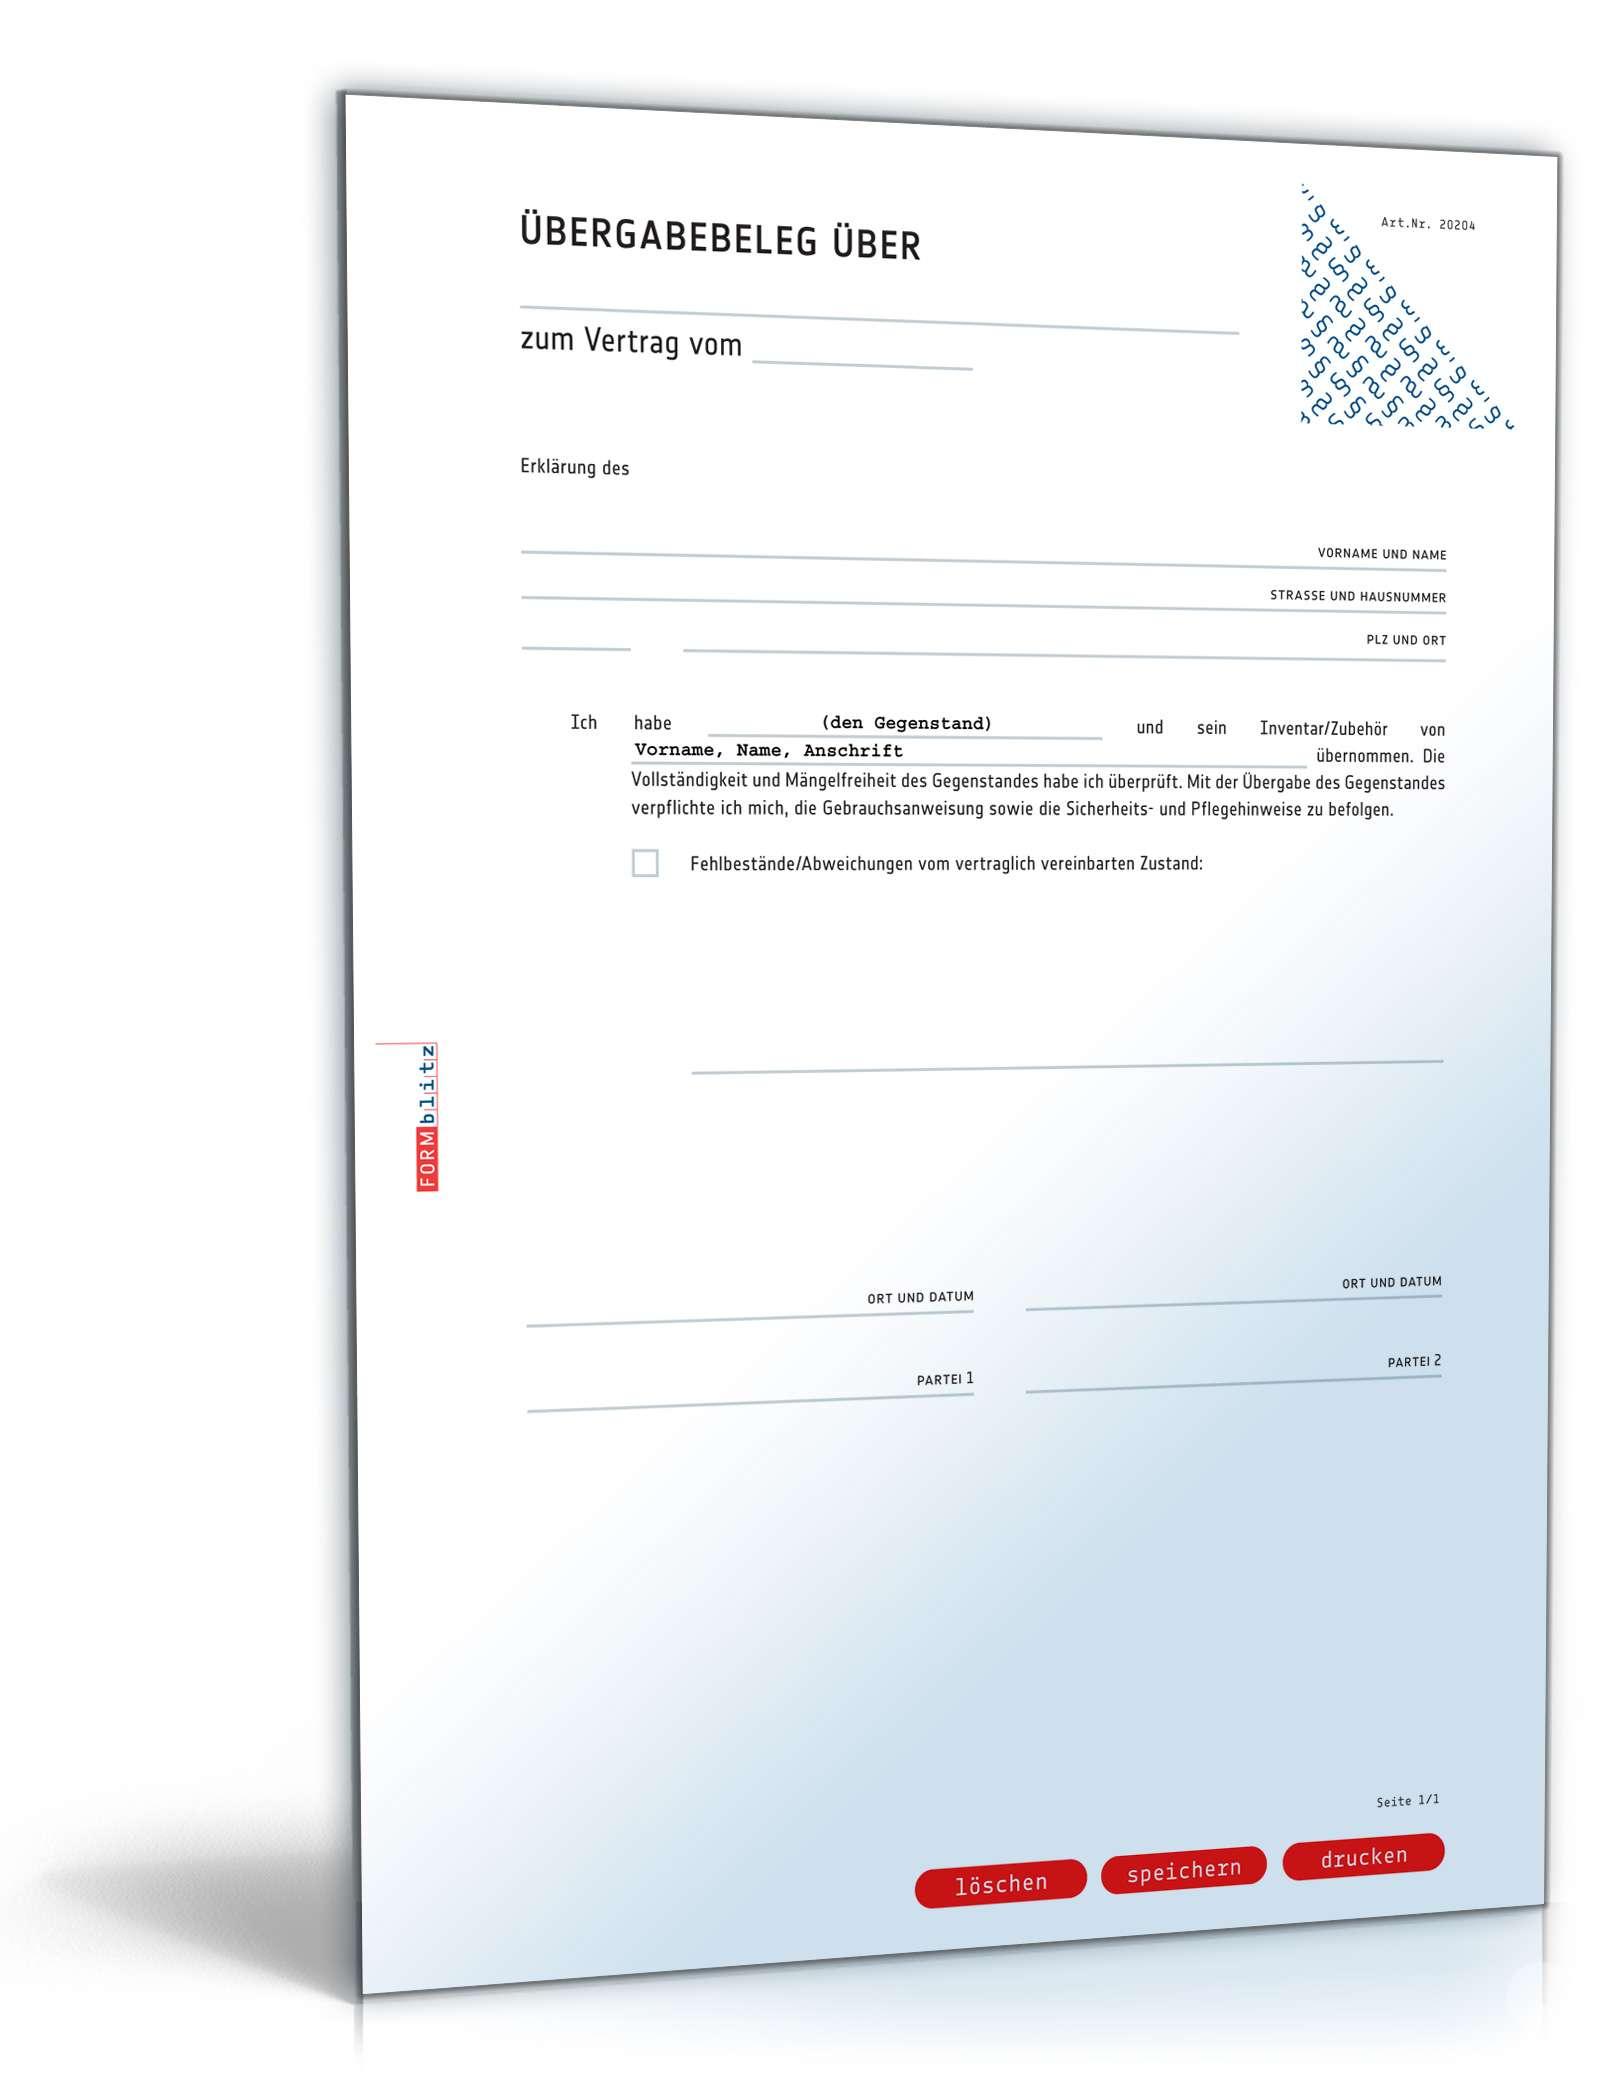 bergabebeleg rckgabebeleg fr gegenstnde zum download - Ubergabeprotokoll Muster Gegenstande